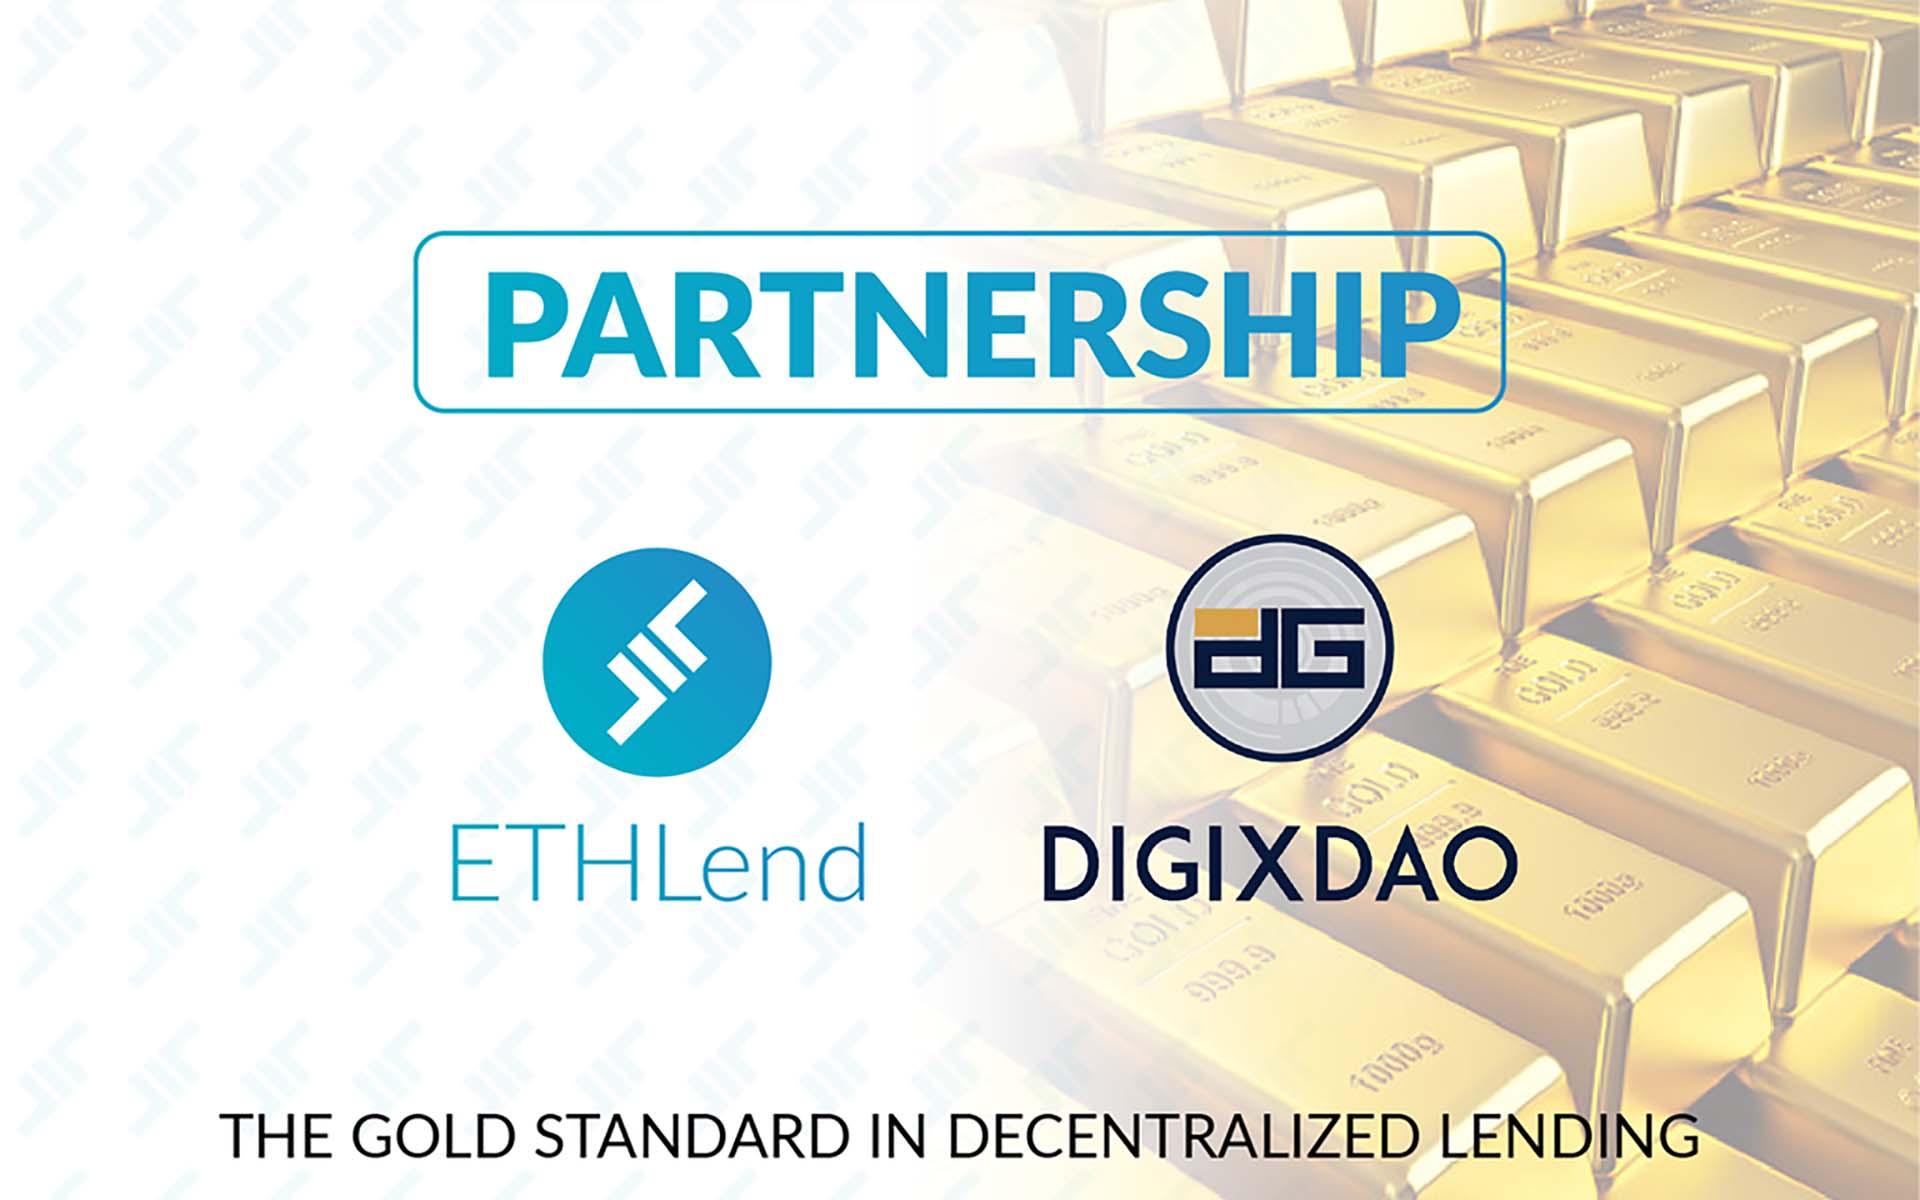 Digix & ETHLend Announce Partnership